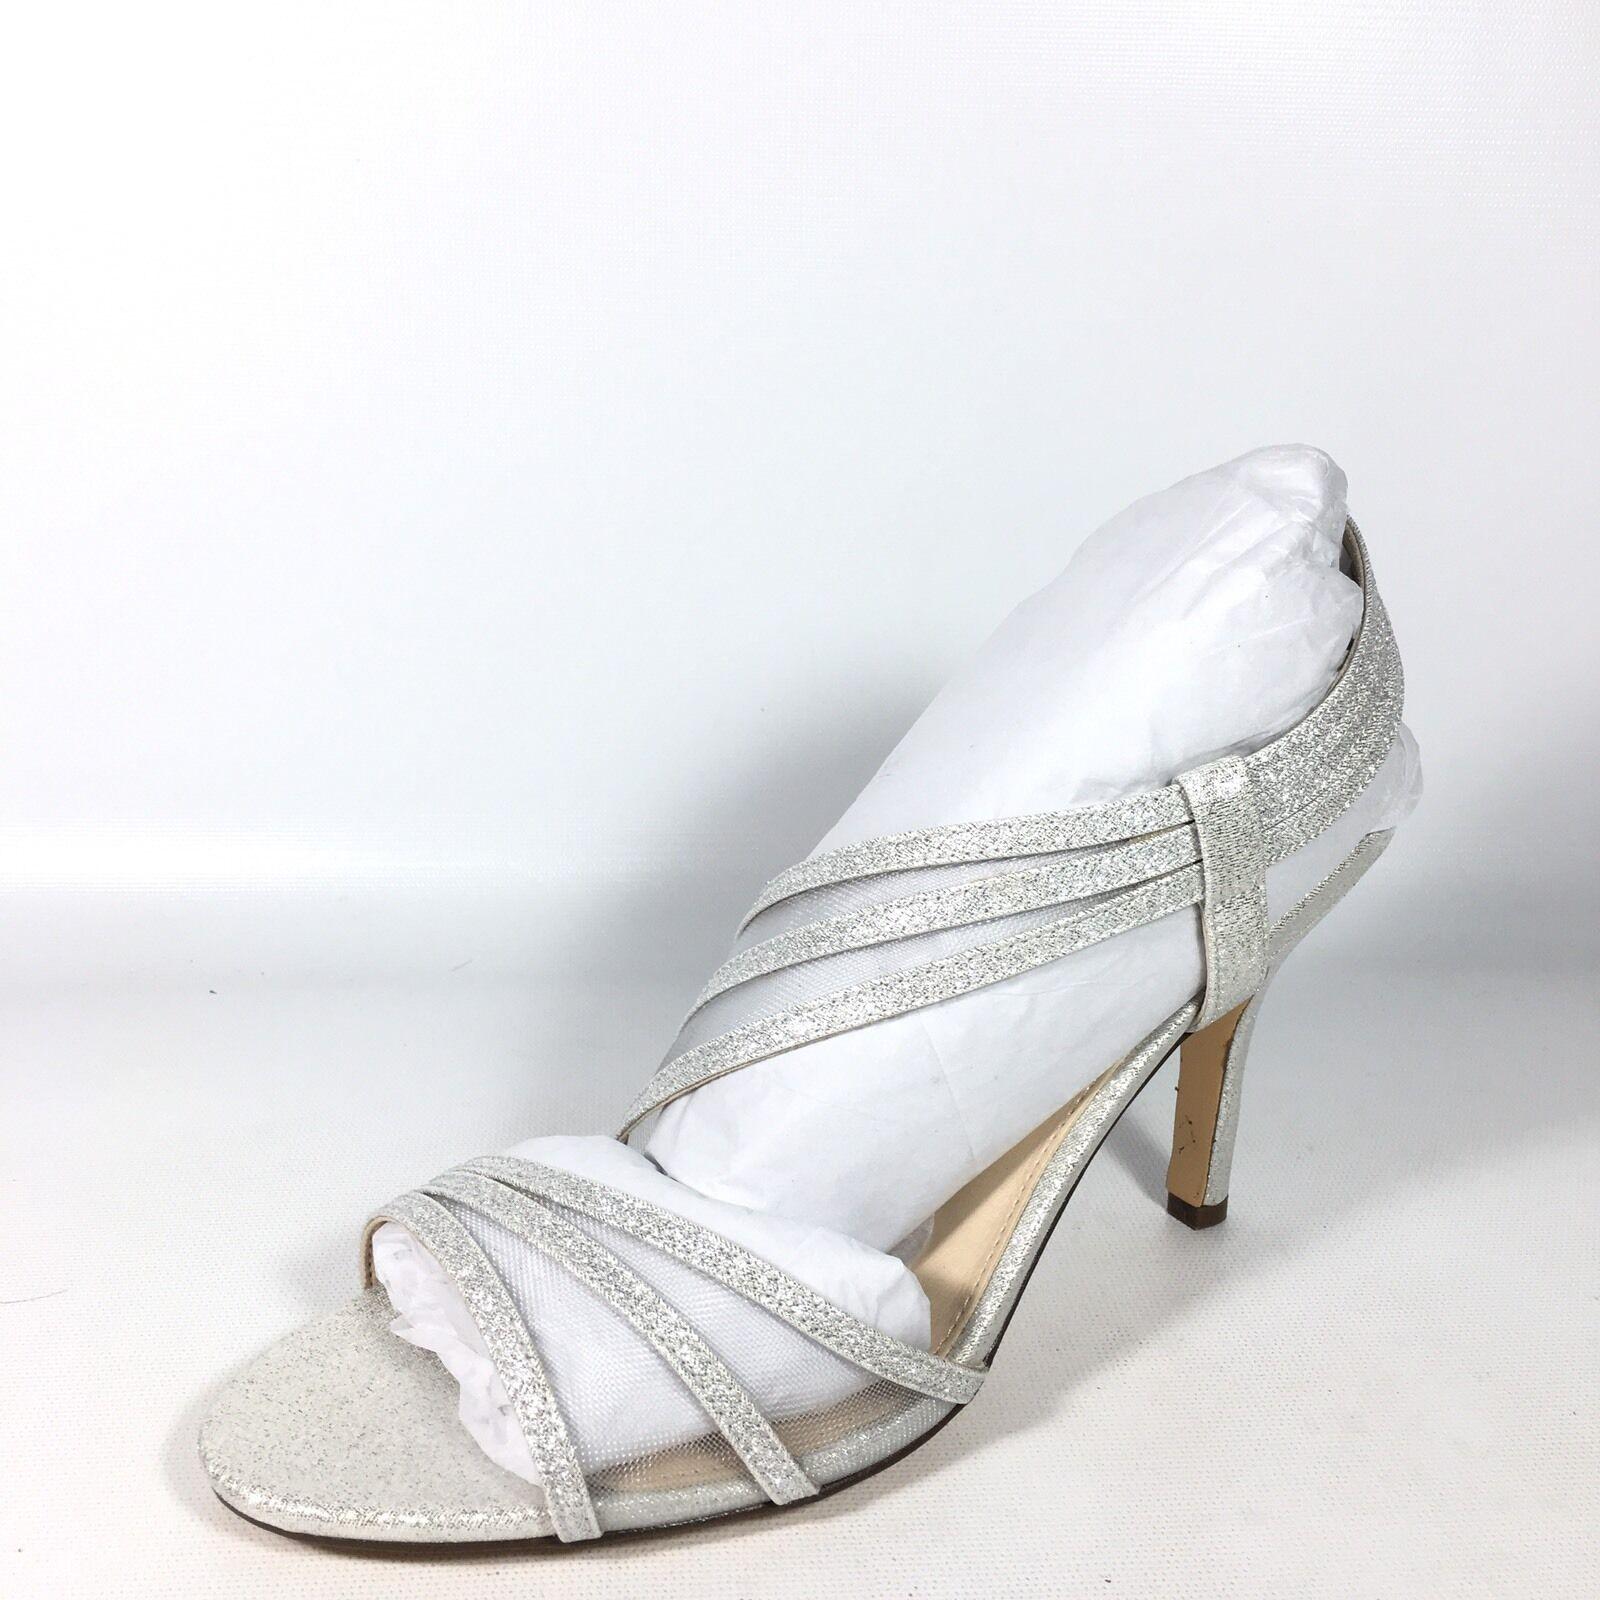 Nina  Vitalia  Women's 8 M Silver Wonderland Formal Dress Sandal Heels